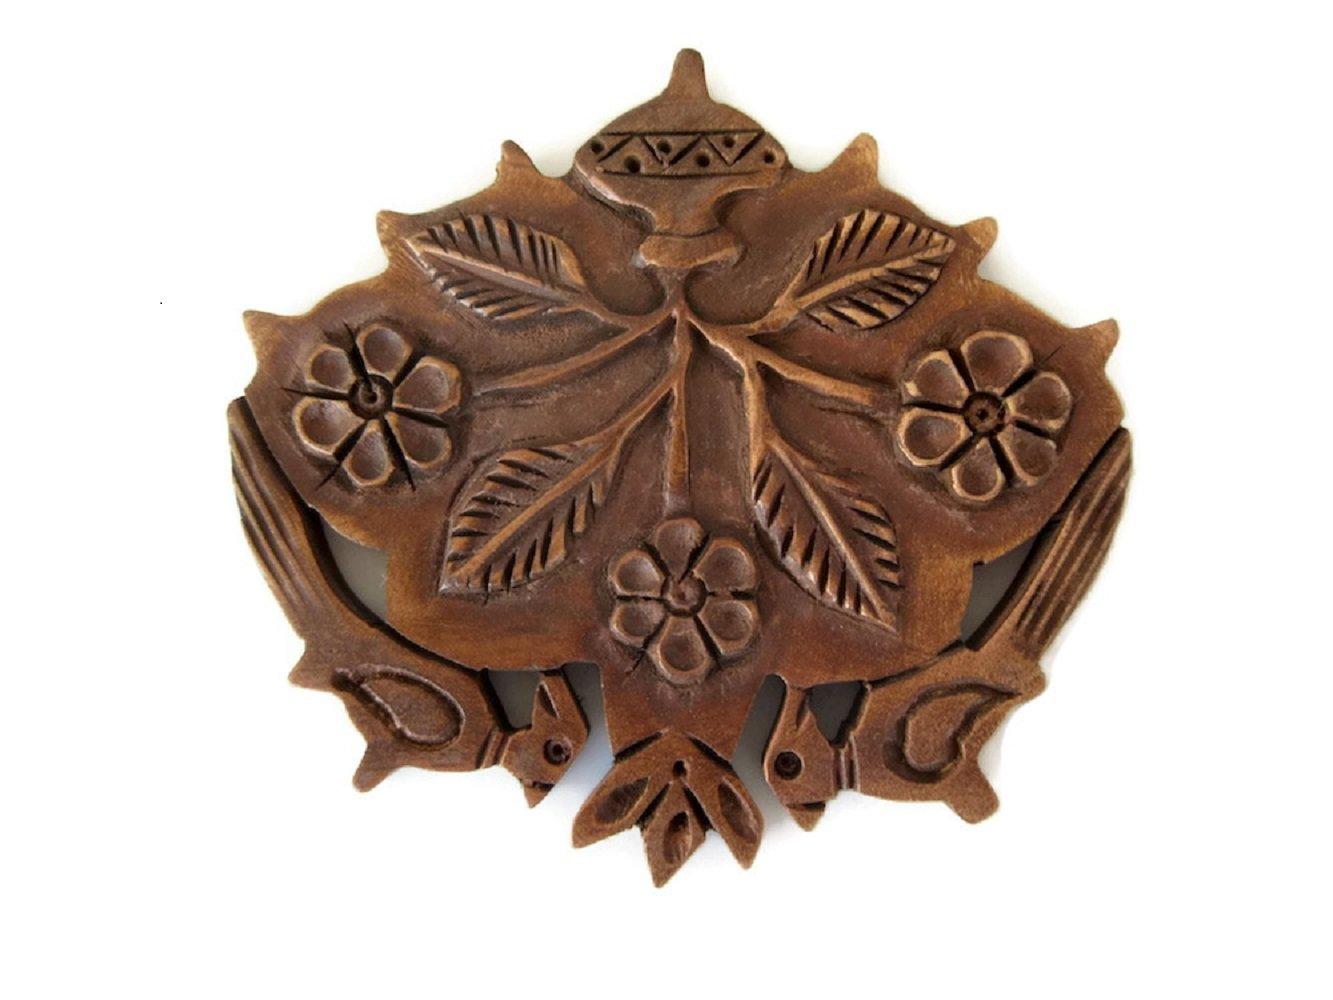 Hand Carved Teak Wood Flower Parrot Pendant, Handmade Flower Pattern Pendant/Necklace,GDS1046/16 (5 Pieces)